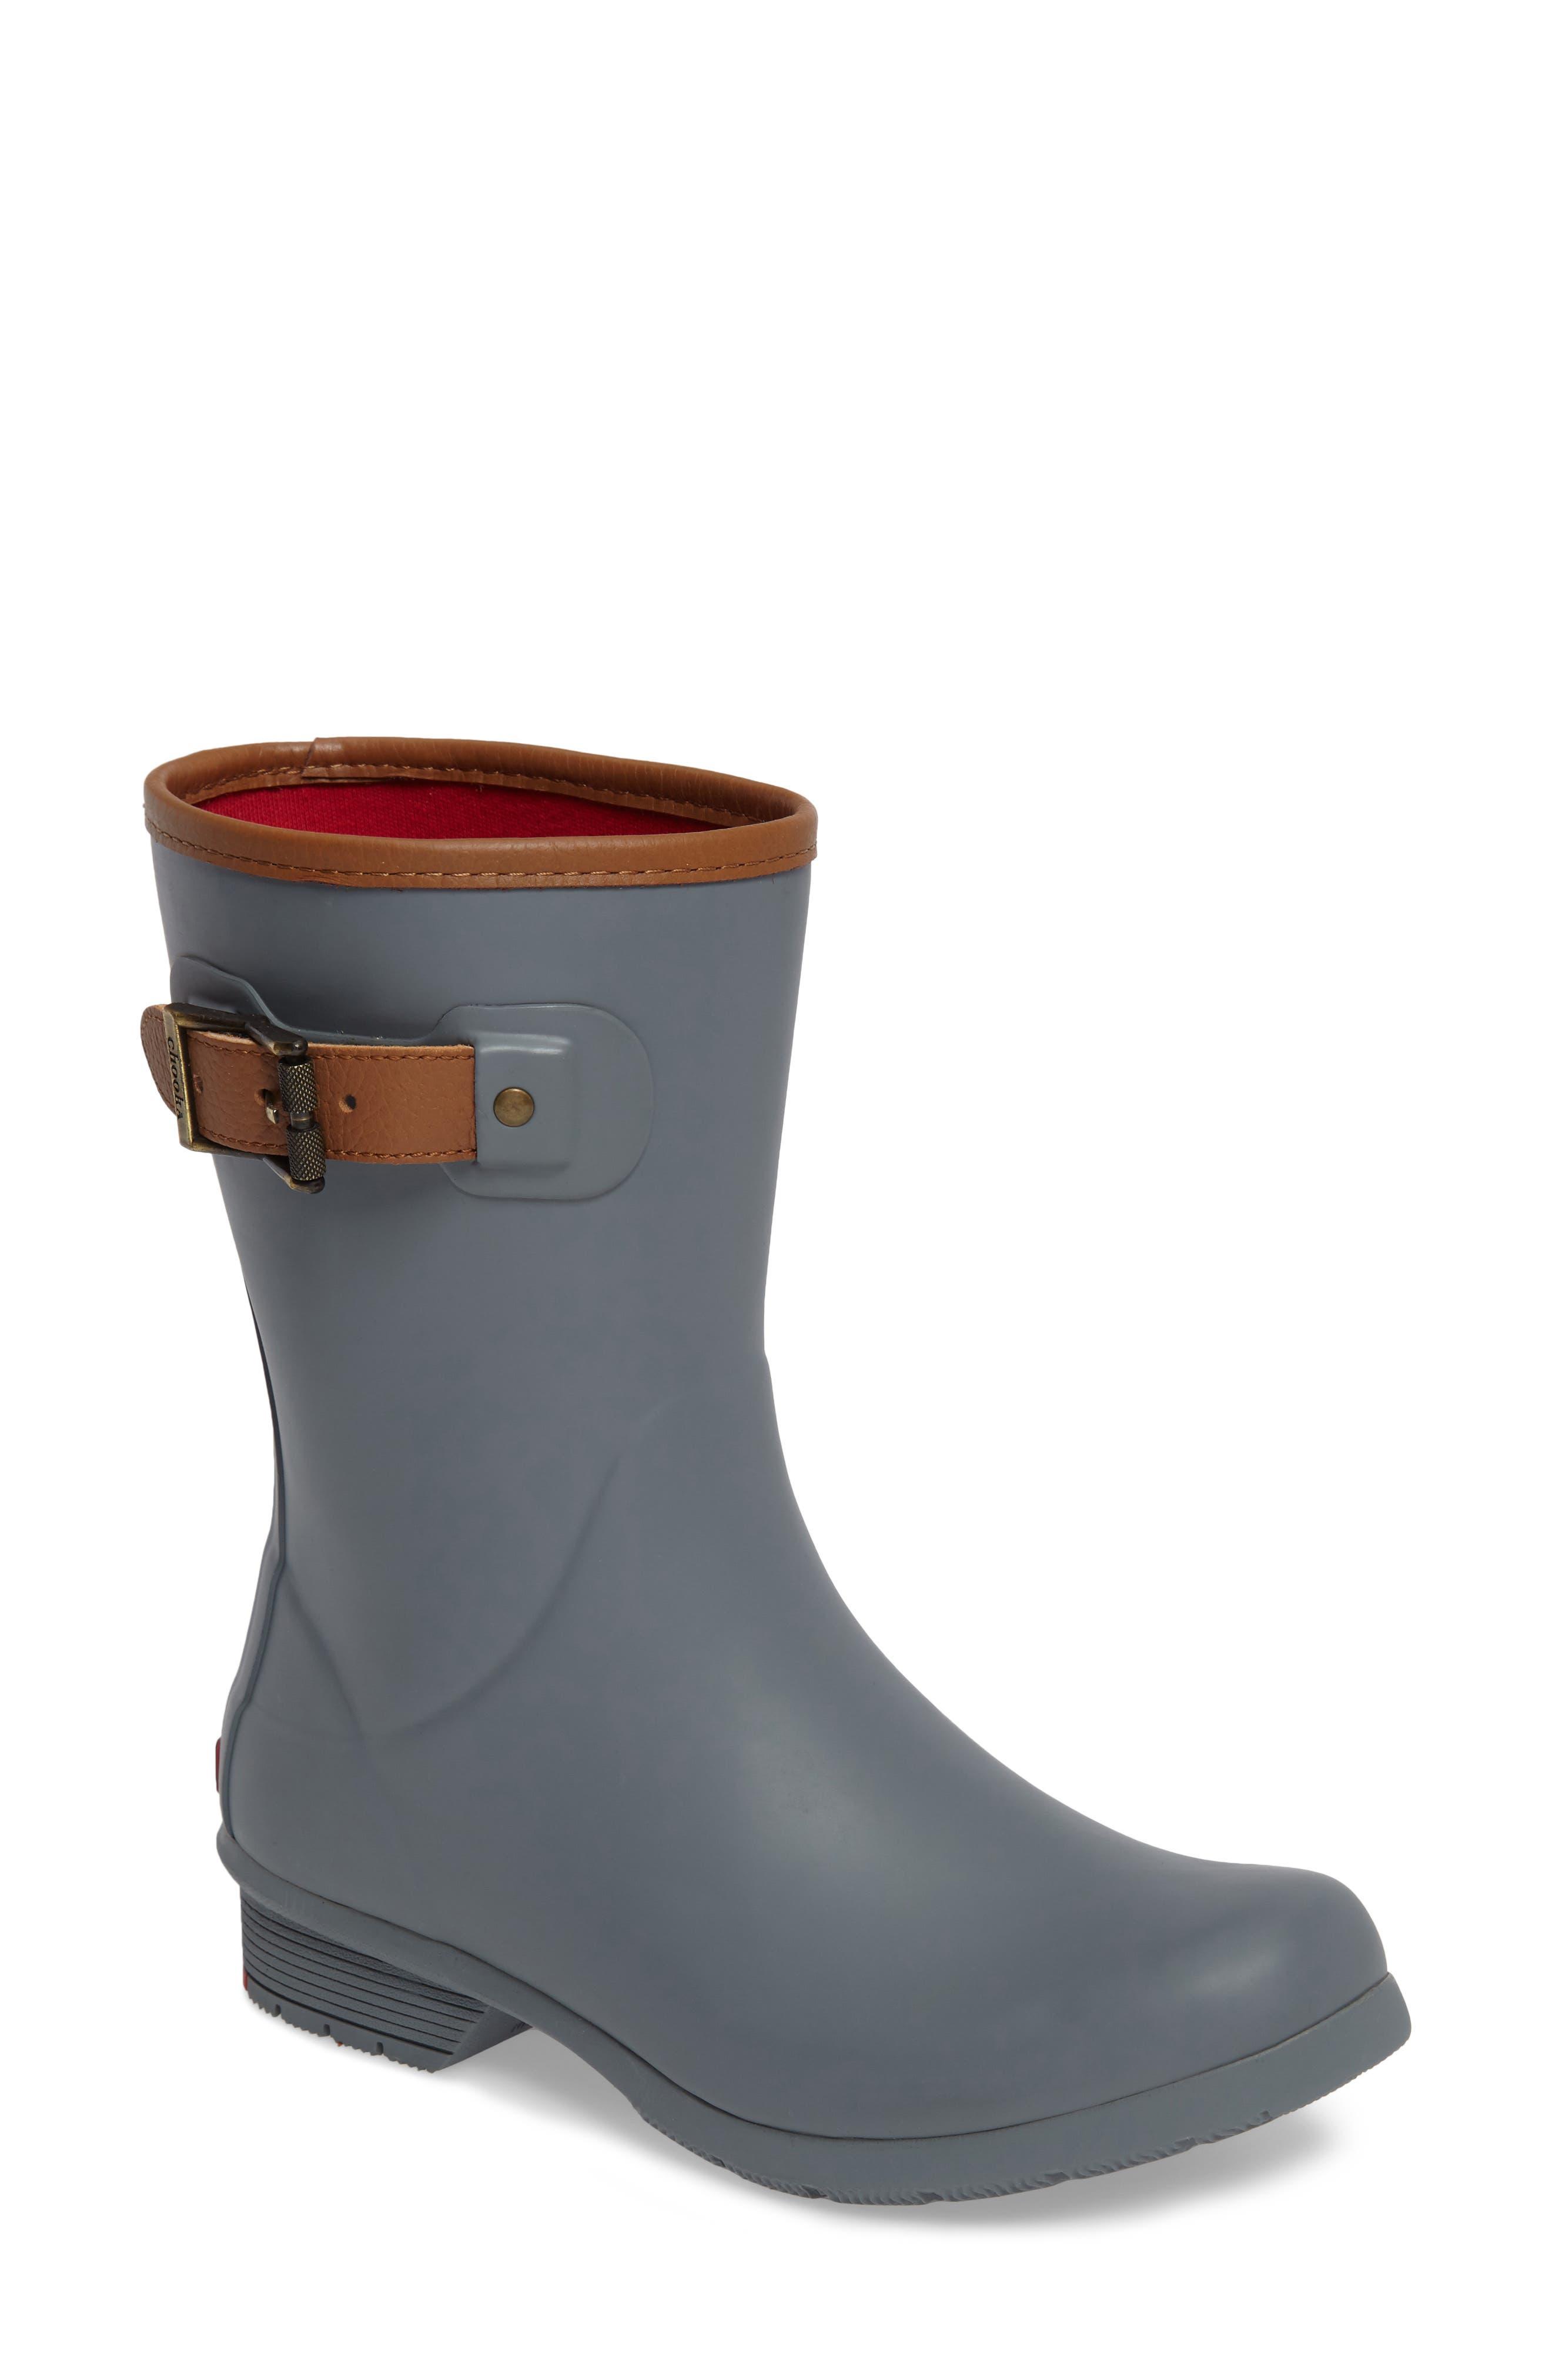 Alternate Image 1 Selected - Chooka City Solid Mid Height Rain Boot (Women)